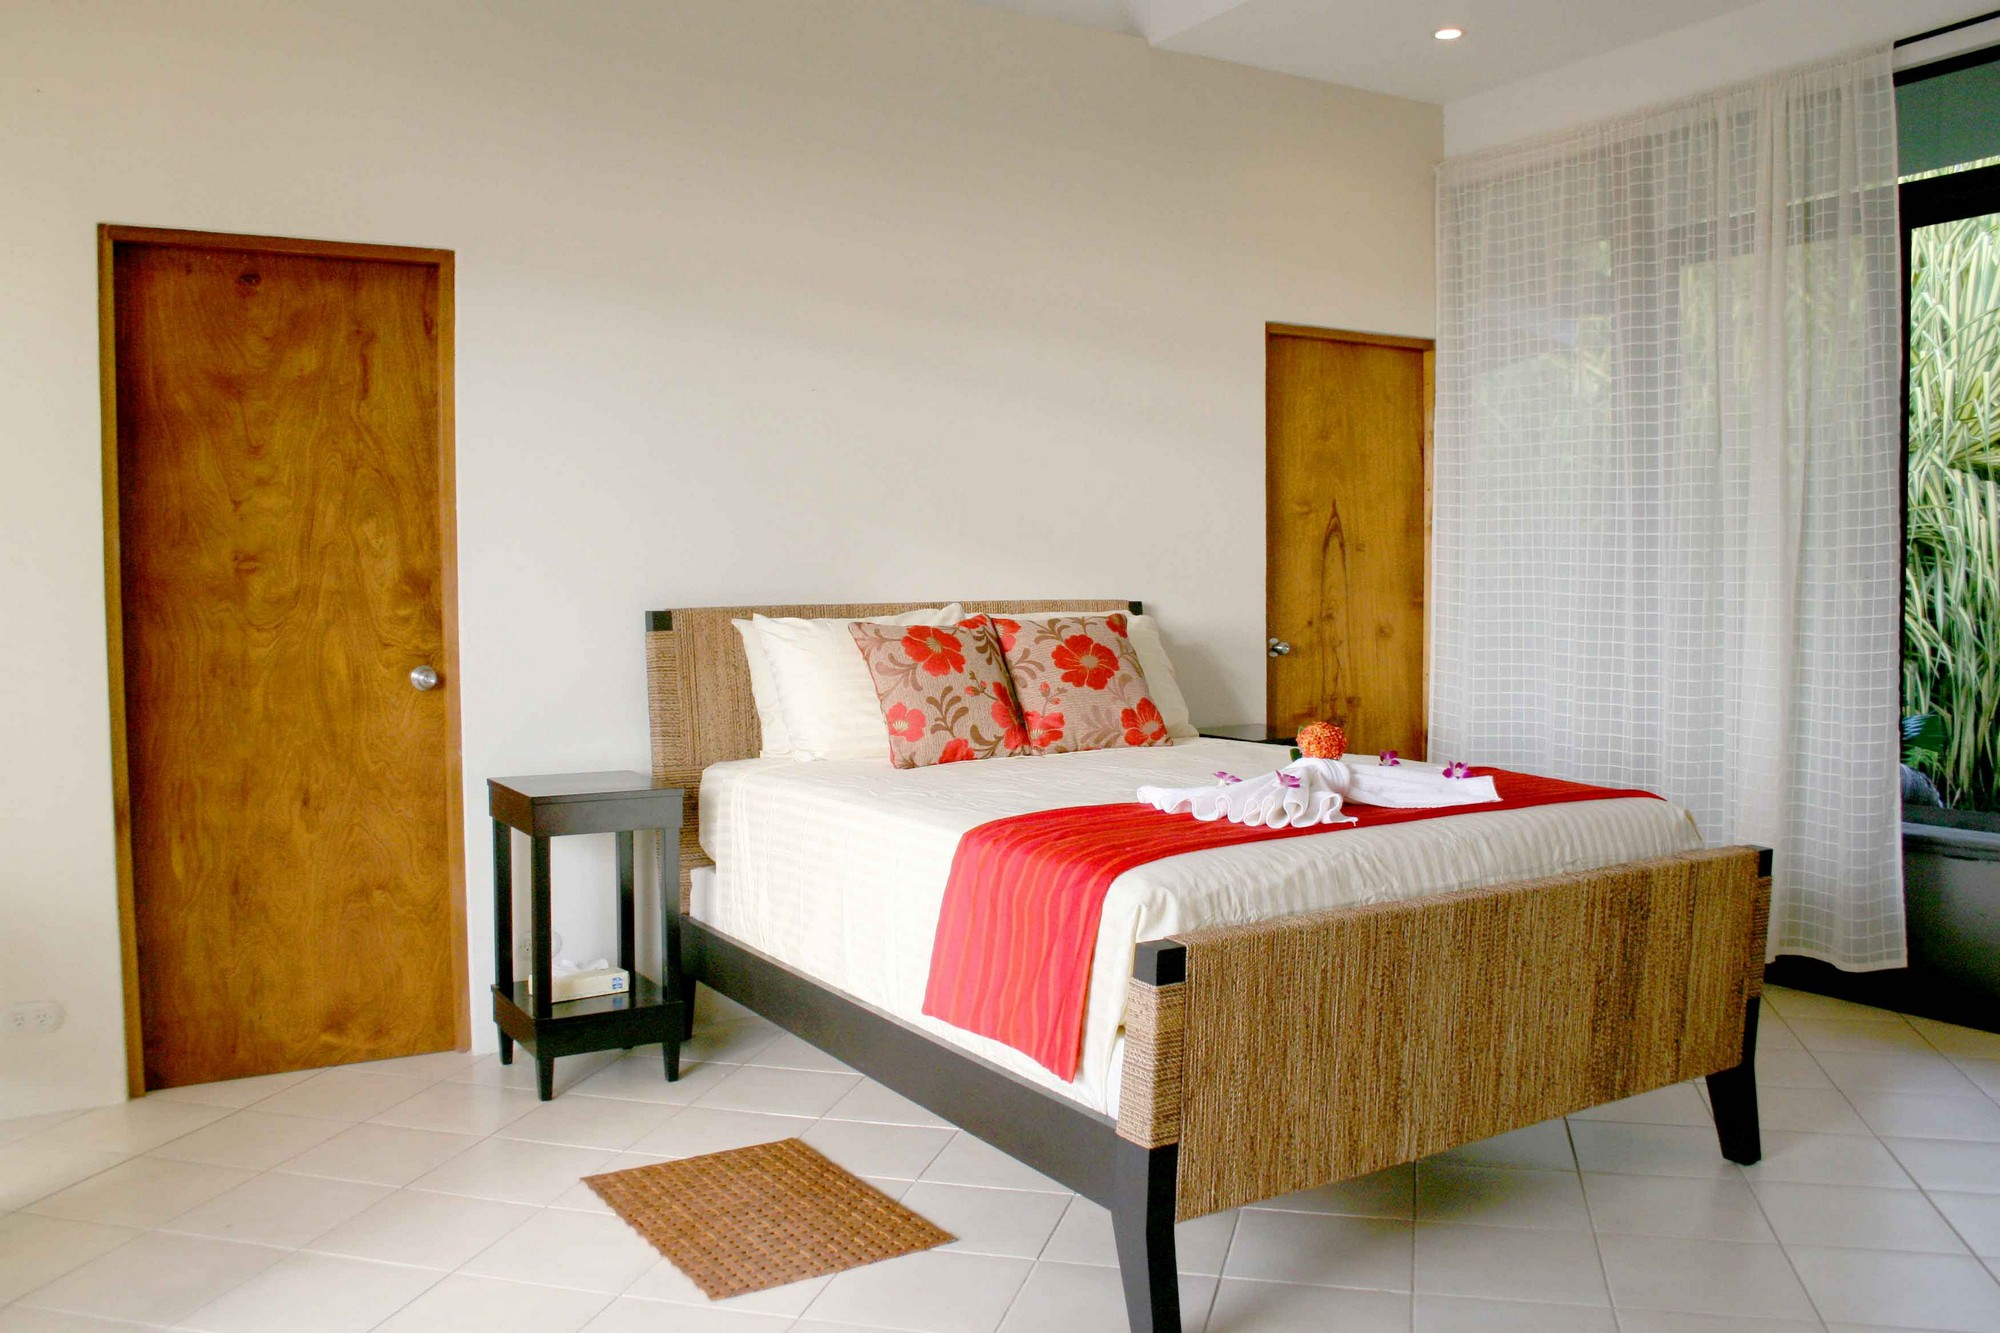 Casa de las Cascadas, Manuel Antonio, Costa Rica With sliding doors/windows on either side, the guest bedroom has good air flow.